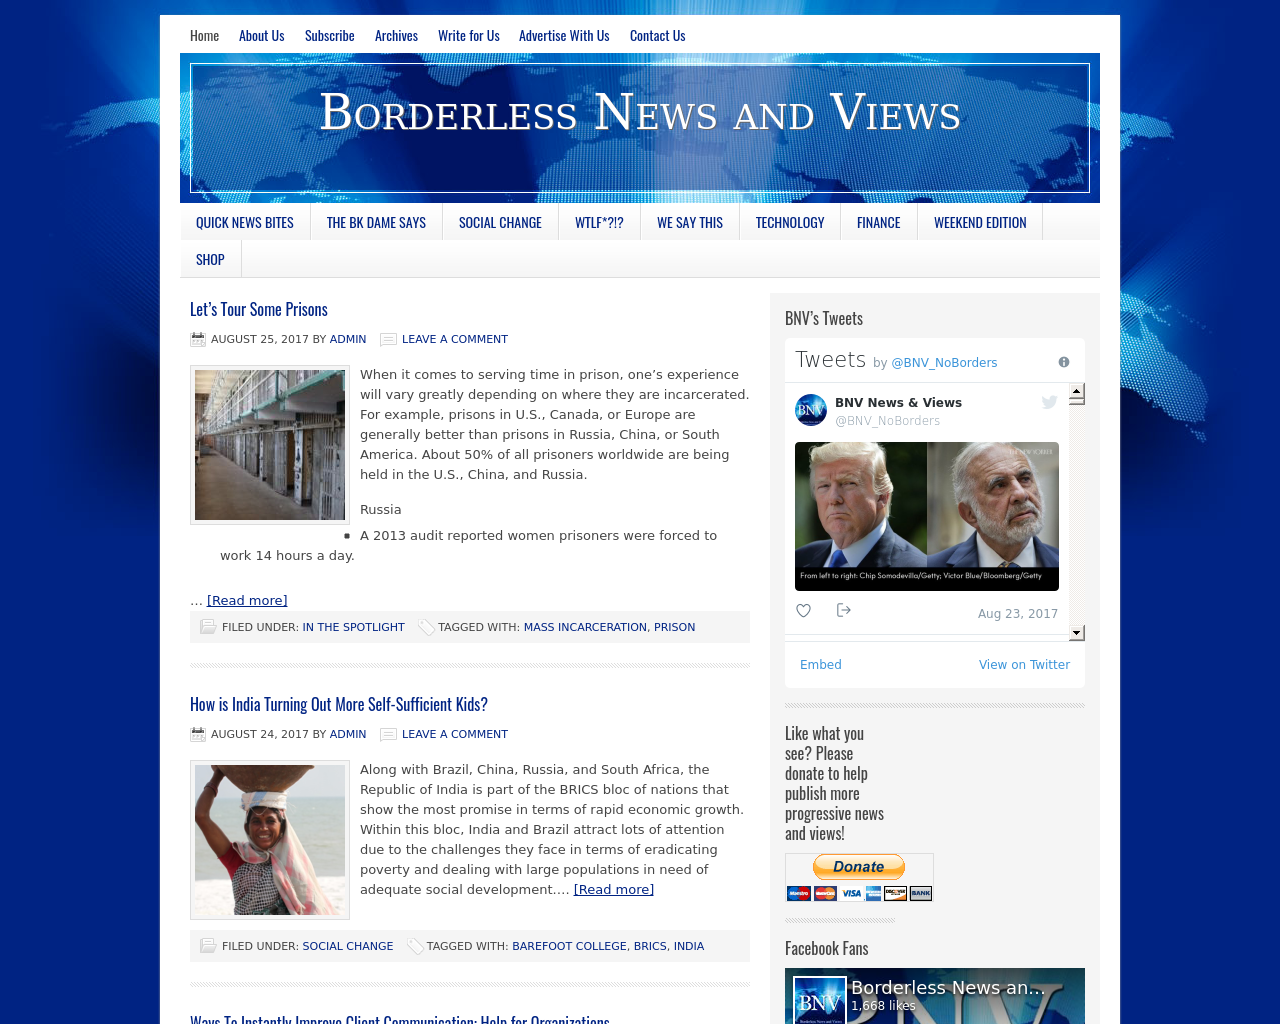 Borderless-News-and-Views-Advertising-Reviews-Pricing